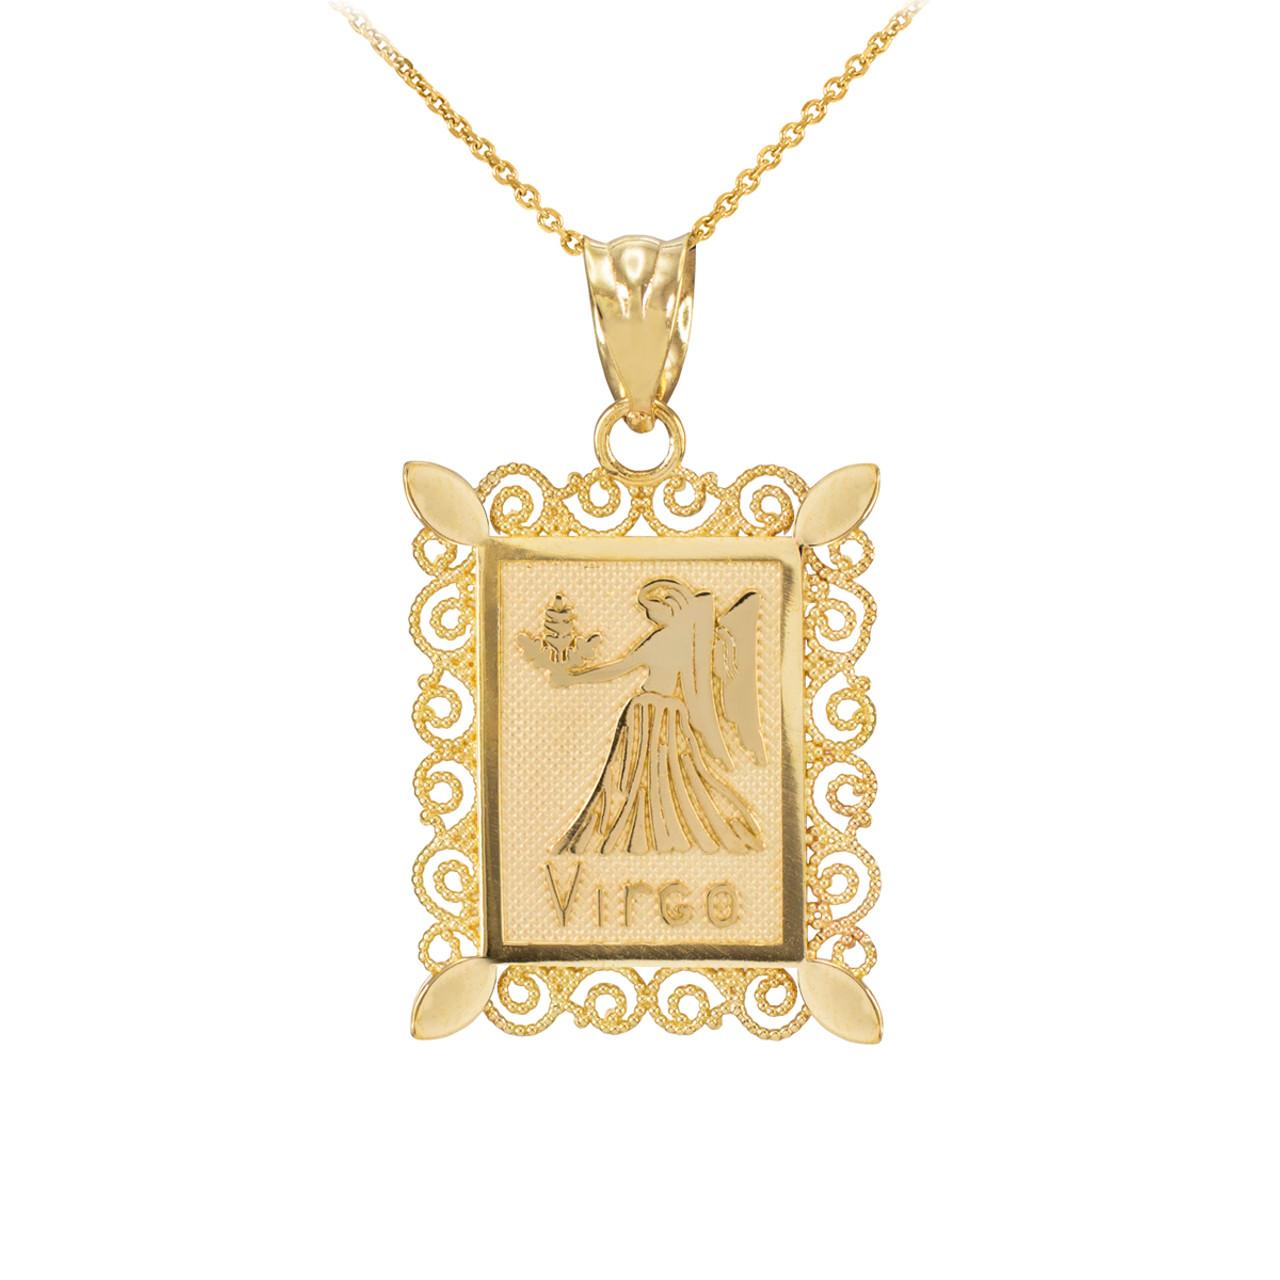 Virgo zodiac sign filigree square pendant necklace gold virgo zodiac sign filigree square pendant necklace aloadofball Images